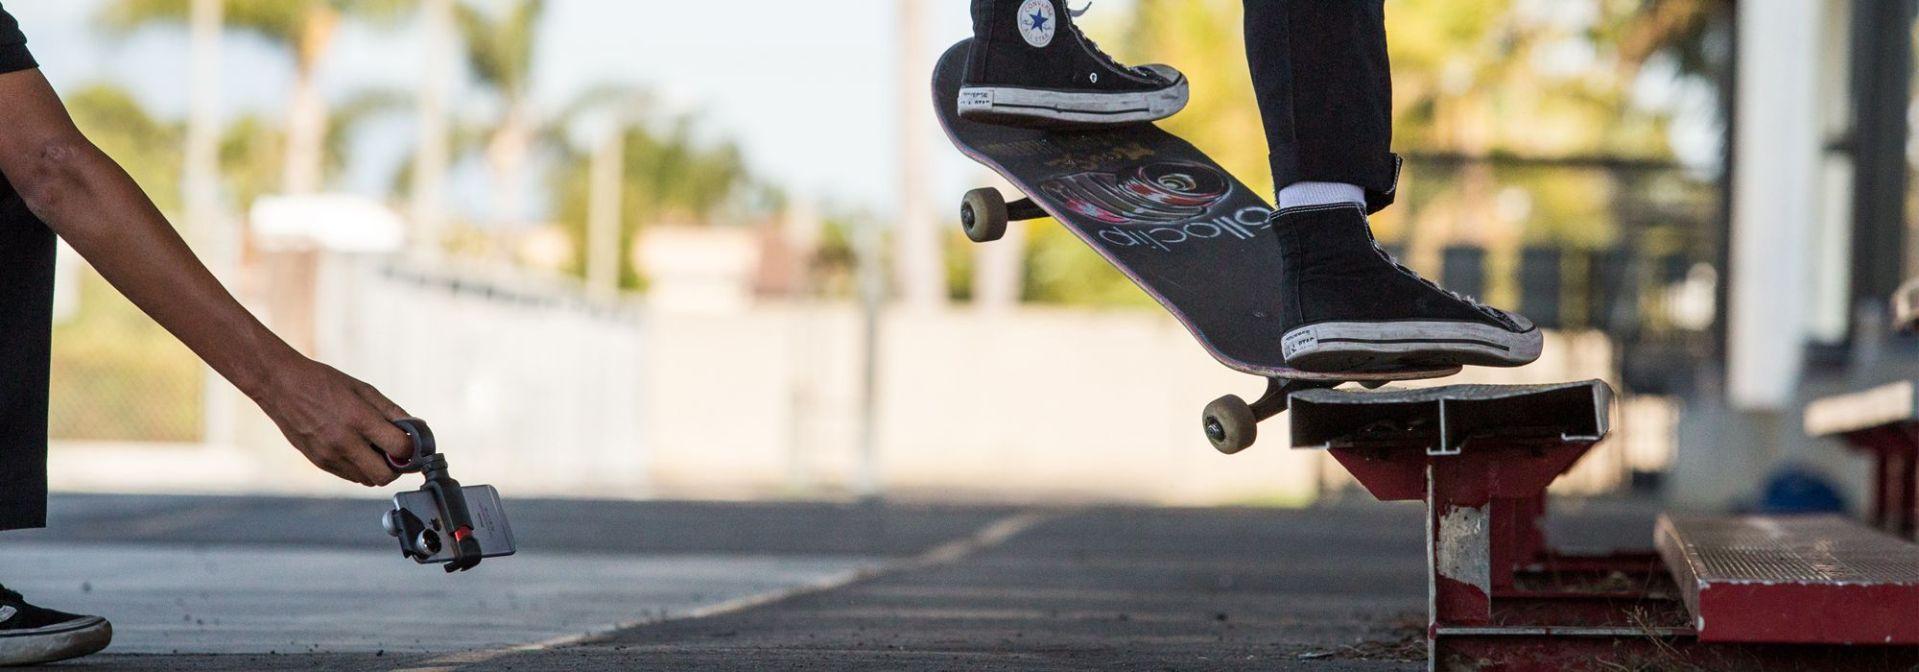 olloclip-pivot-skate-o-futuro-e-mac-tiago-peixinho